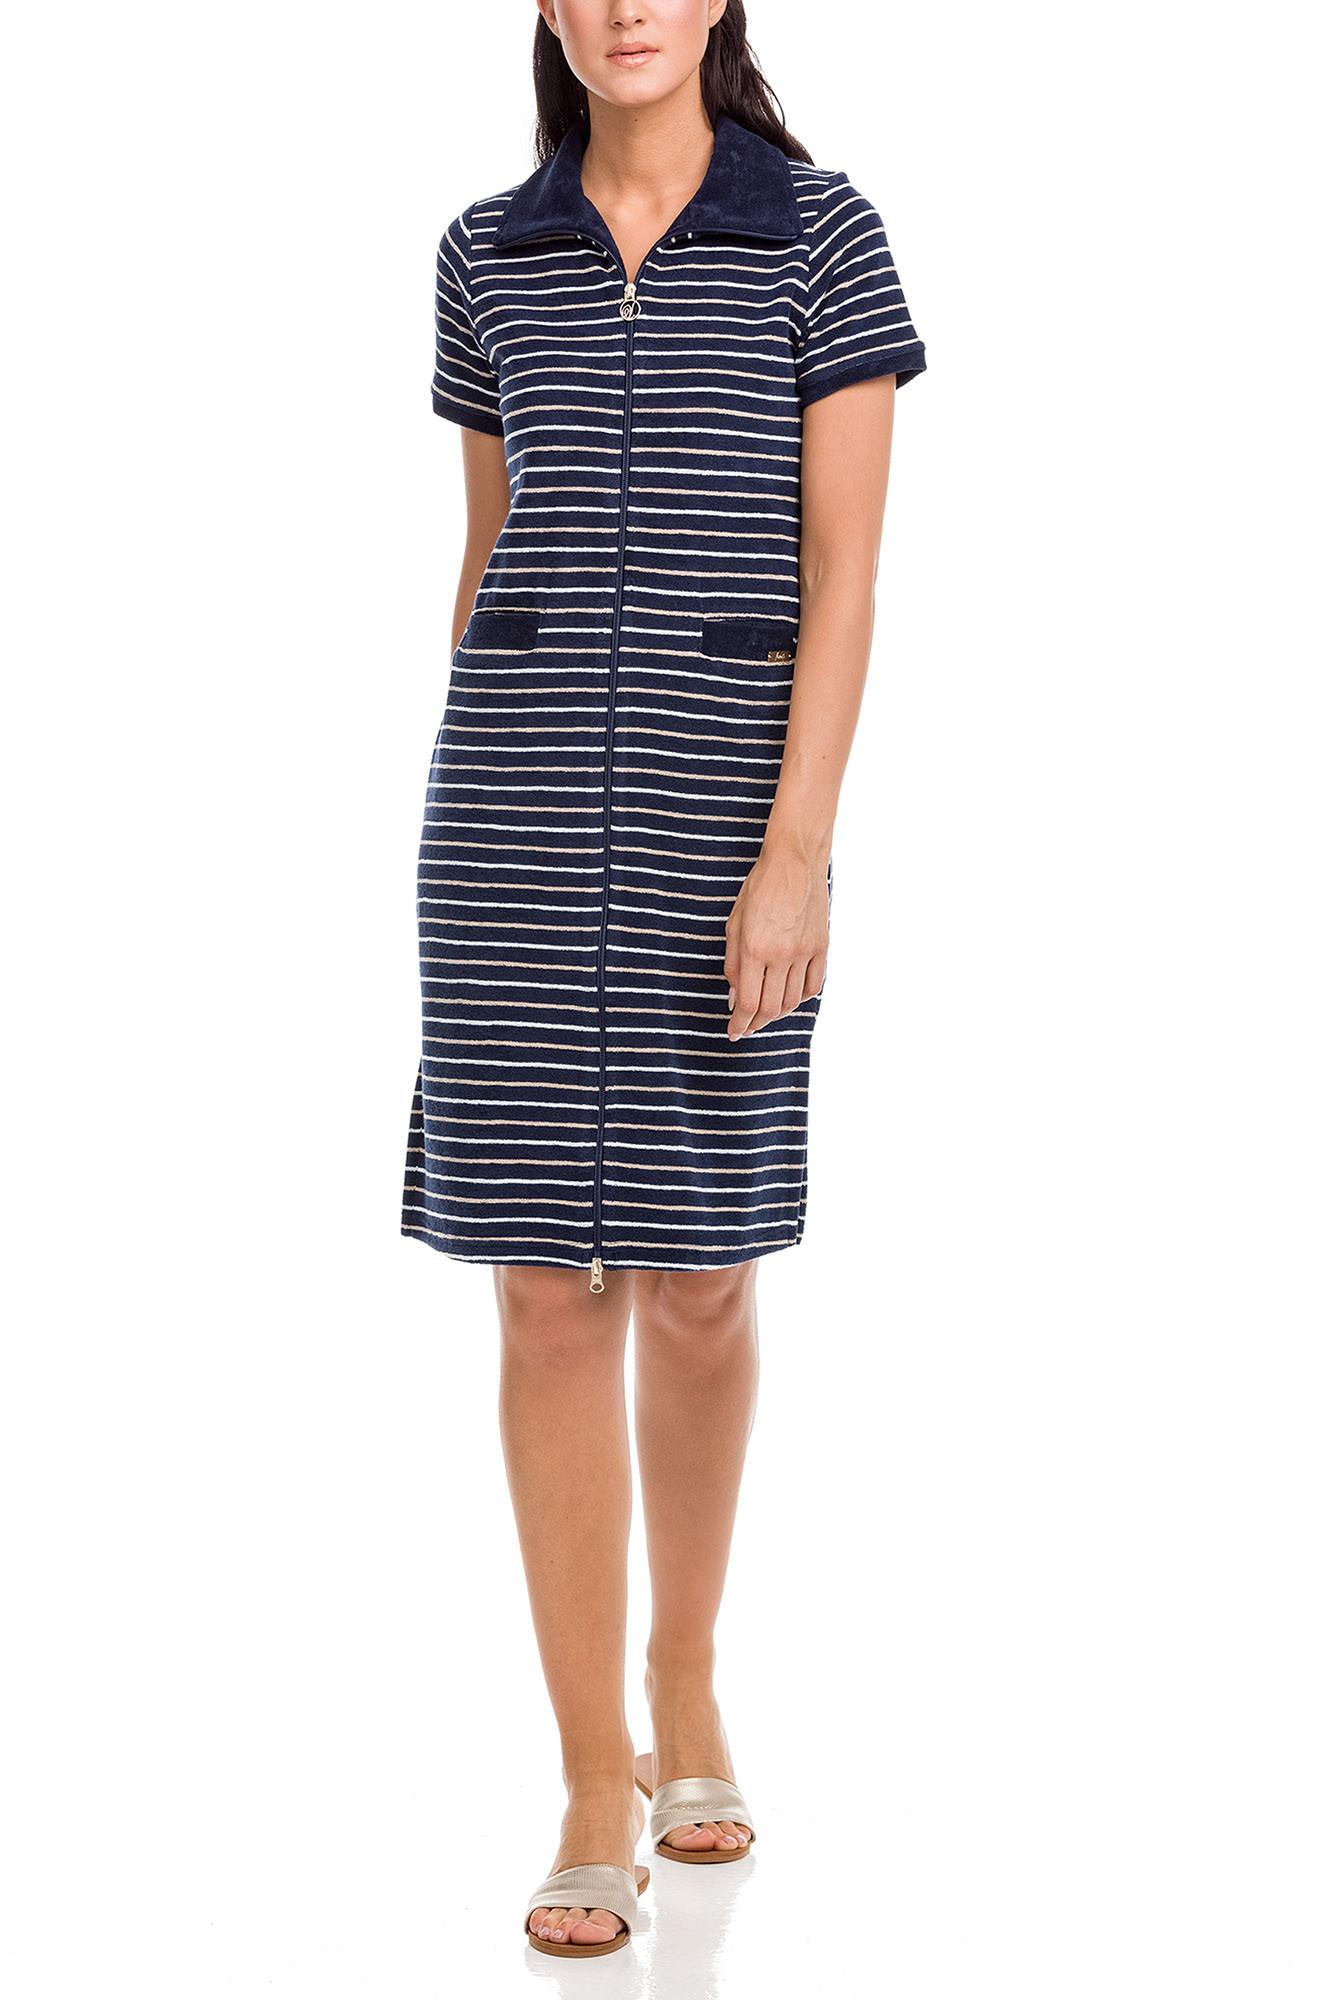 Vamp - Dámske šaty 12577 - Vamp blue s